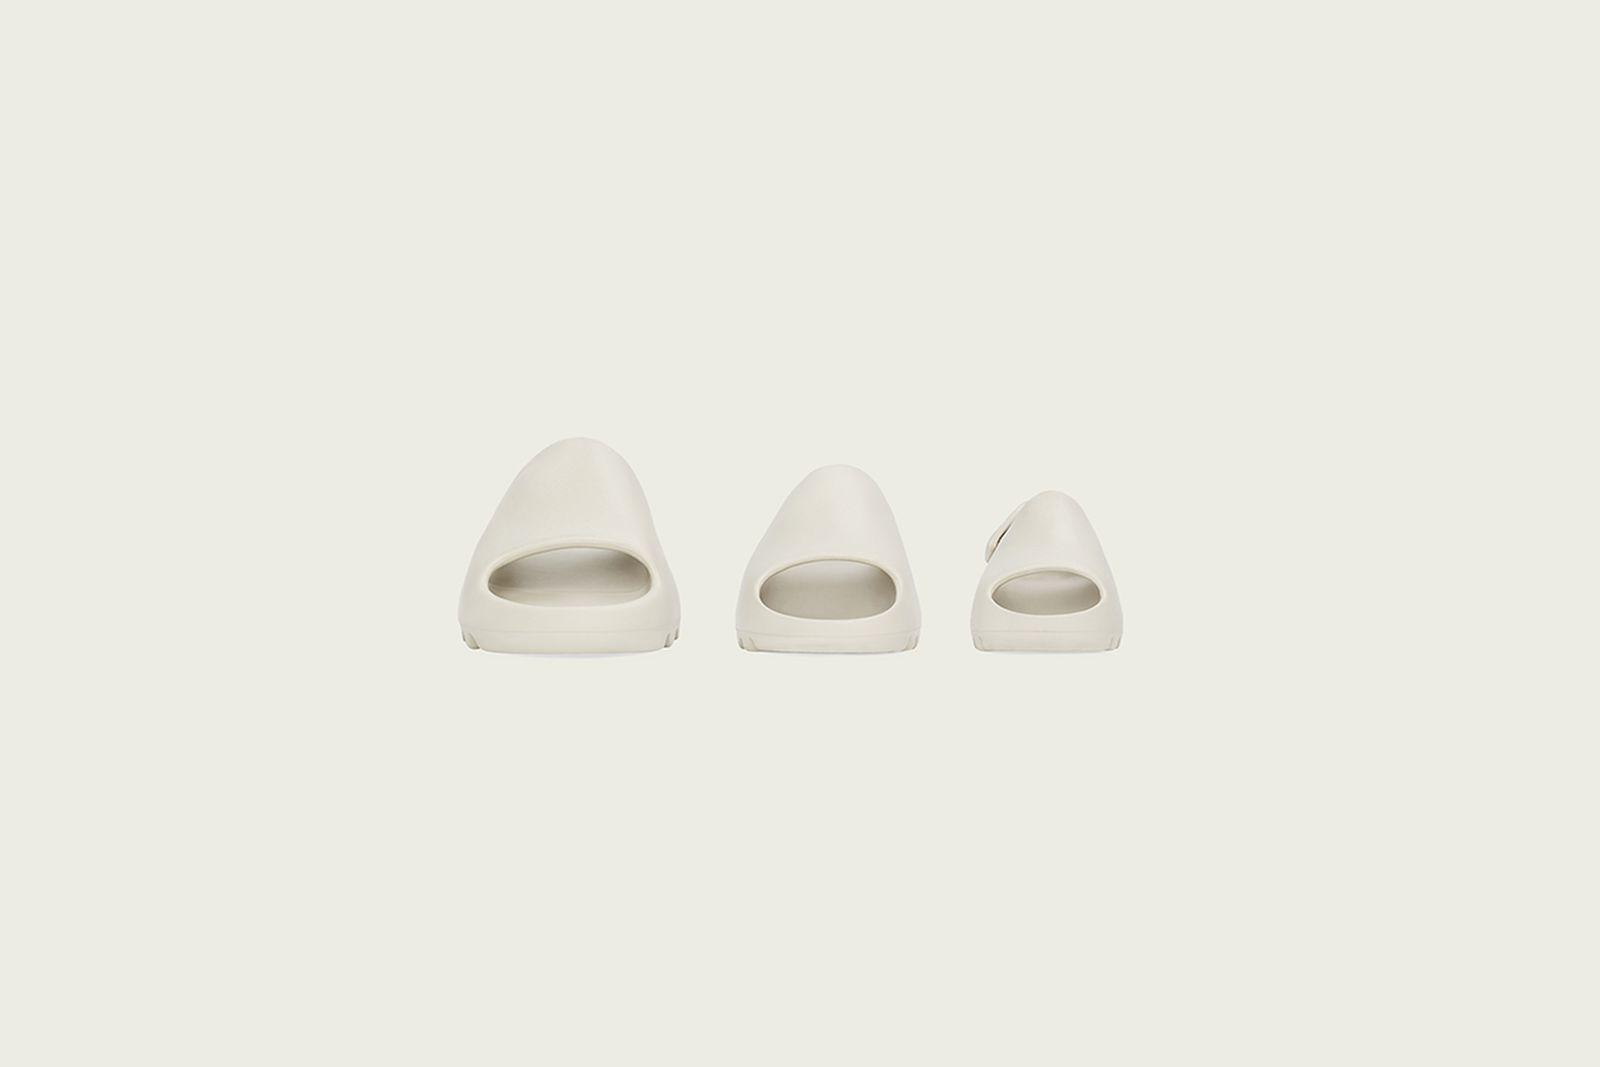 adidas-yeezy-slide-release-date-price-03